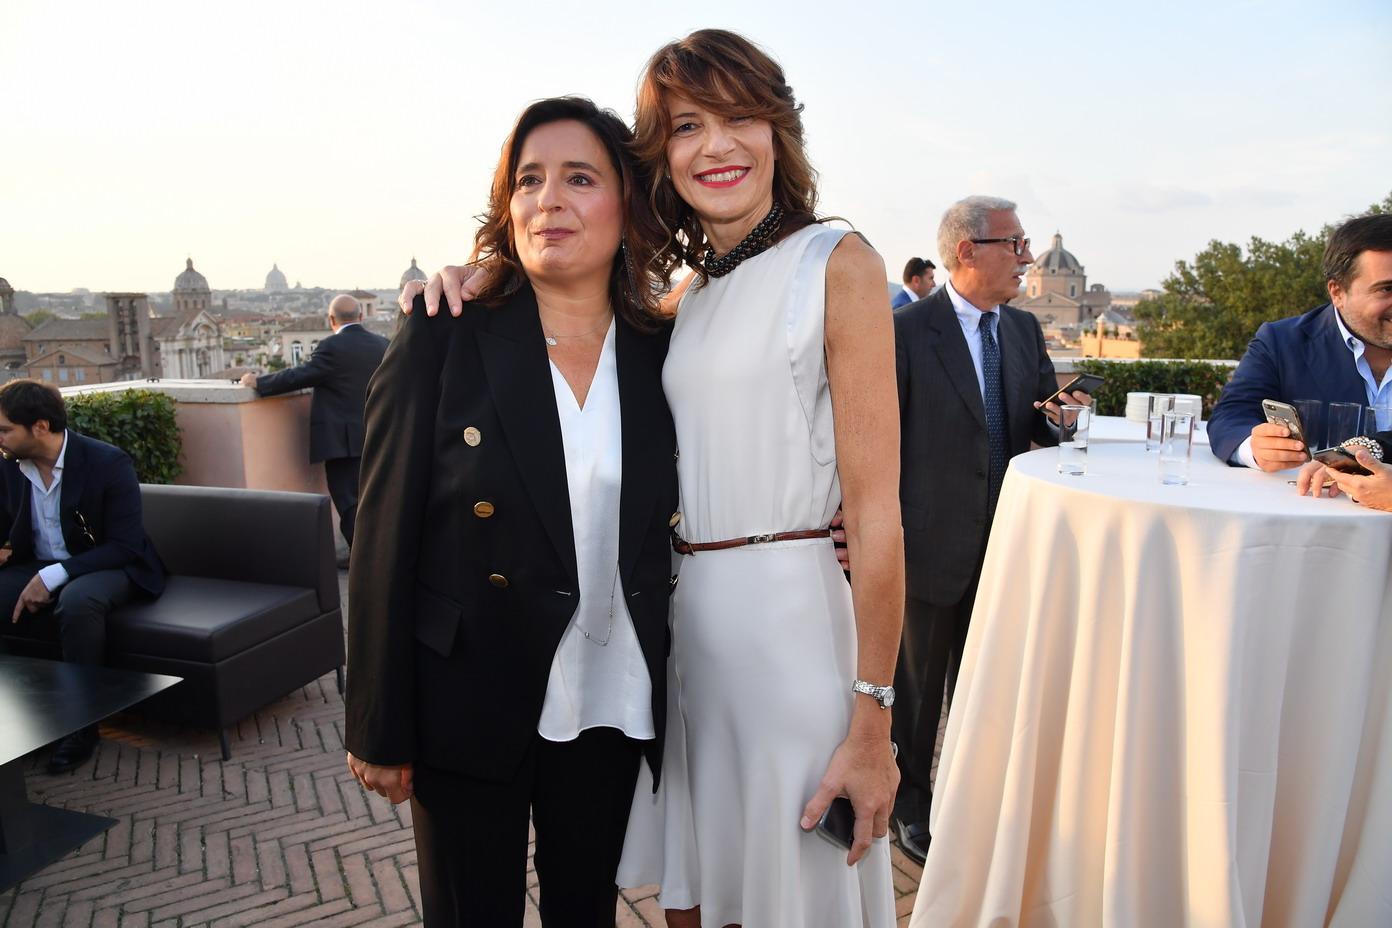 Sabrina Florio, Silvia De Dominicis